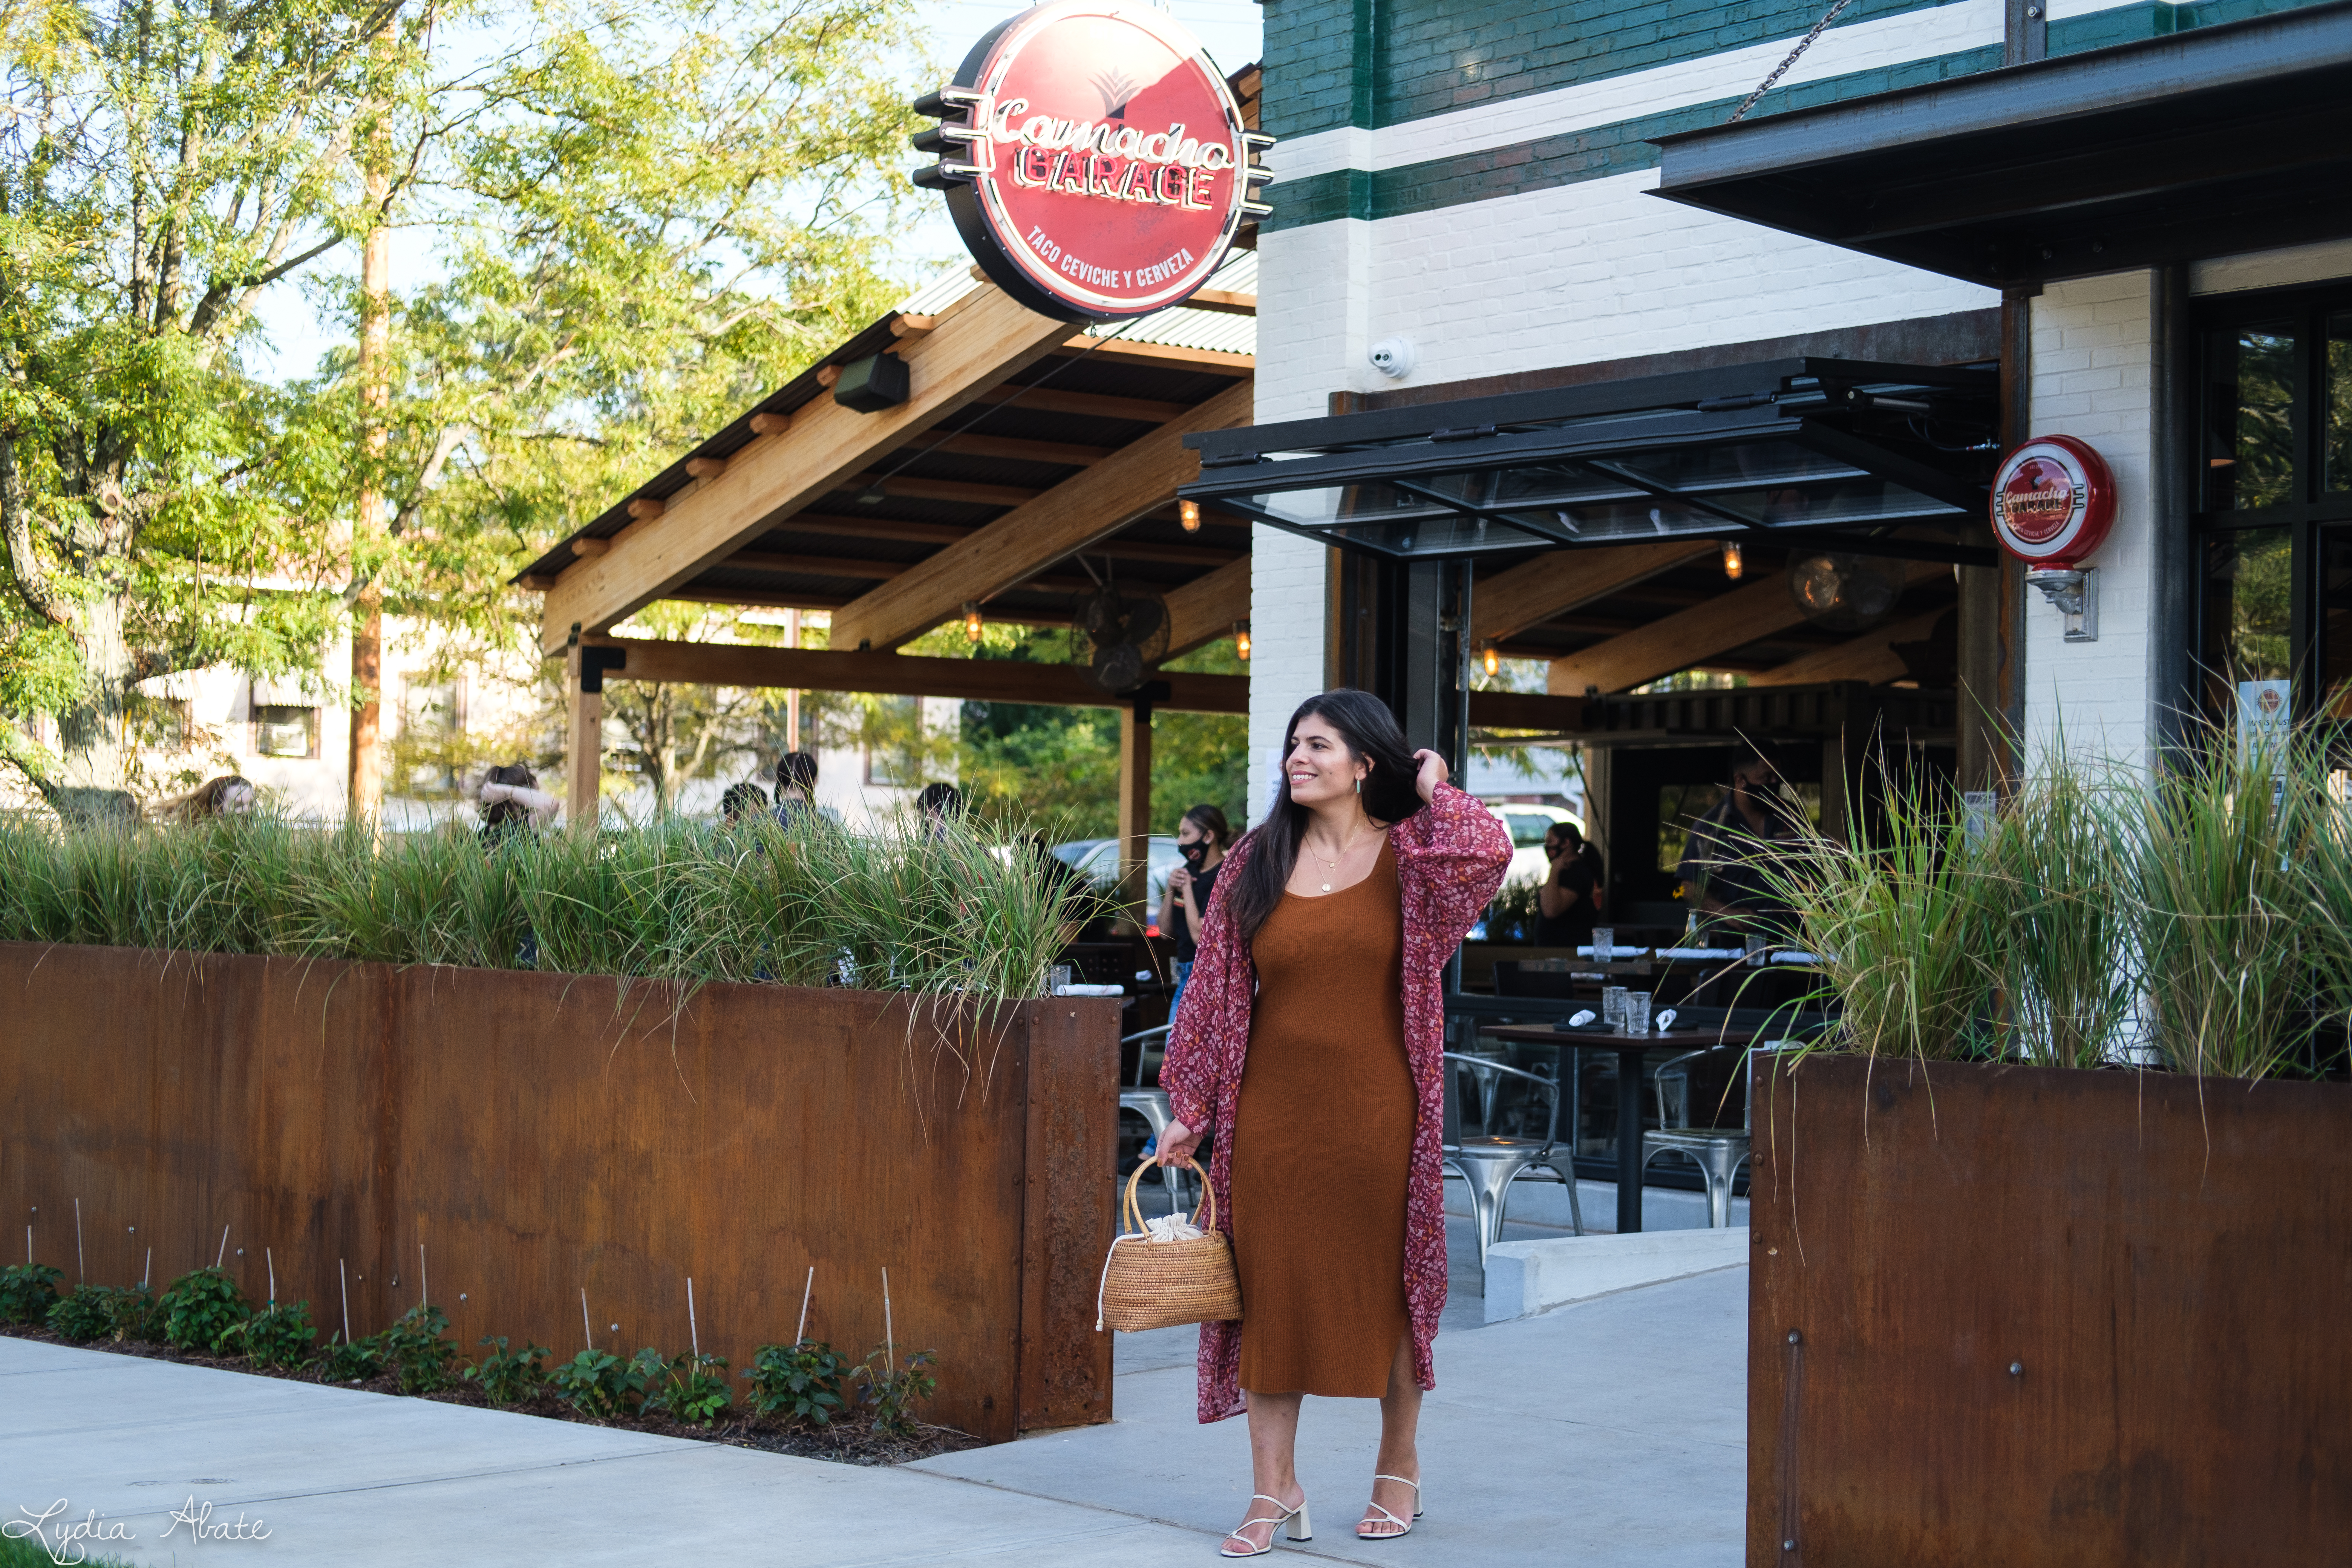 rust knit sheath dress, red floral kimono, basket bag, strappy sandals-13.jpg